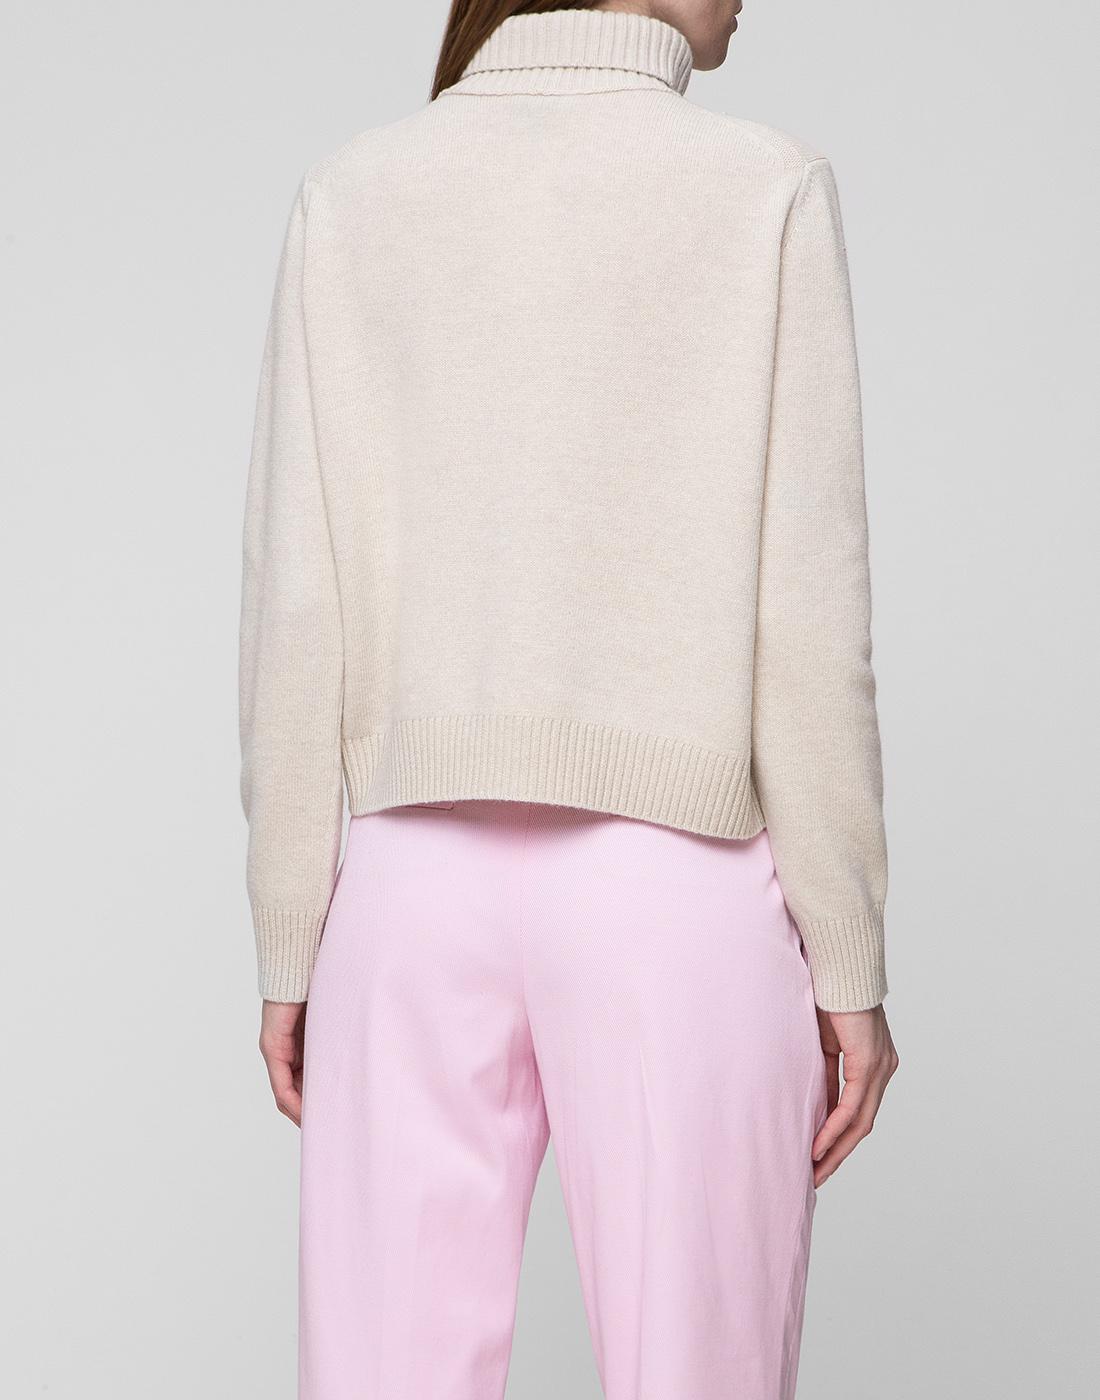 Женские розовые брюки Dorothee Schumacher S640403/421-4